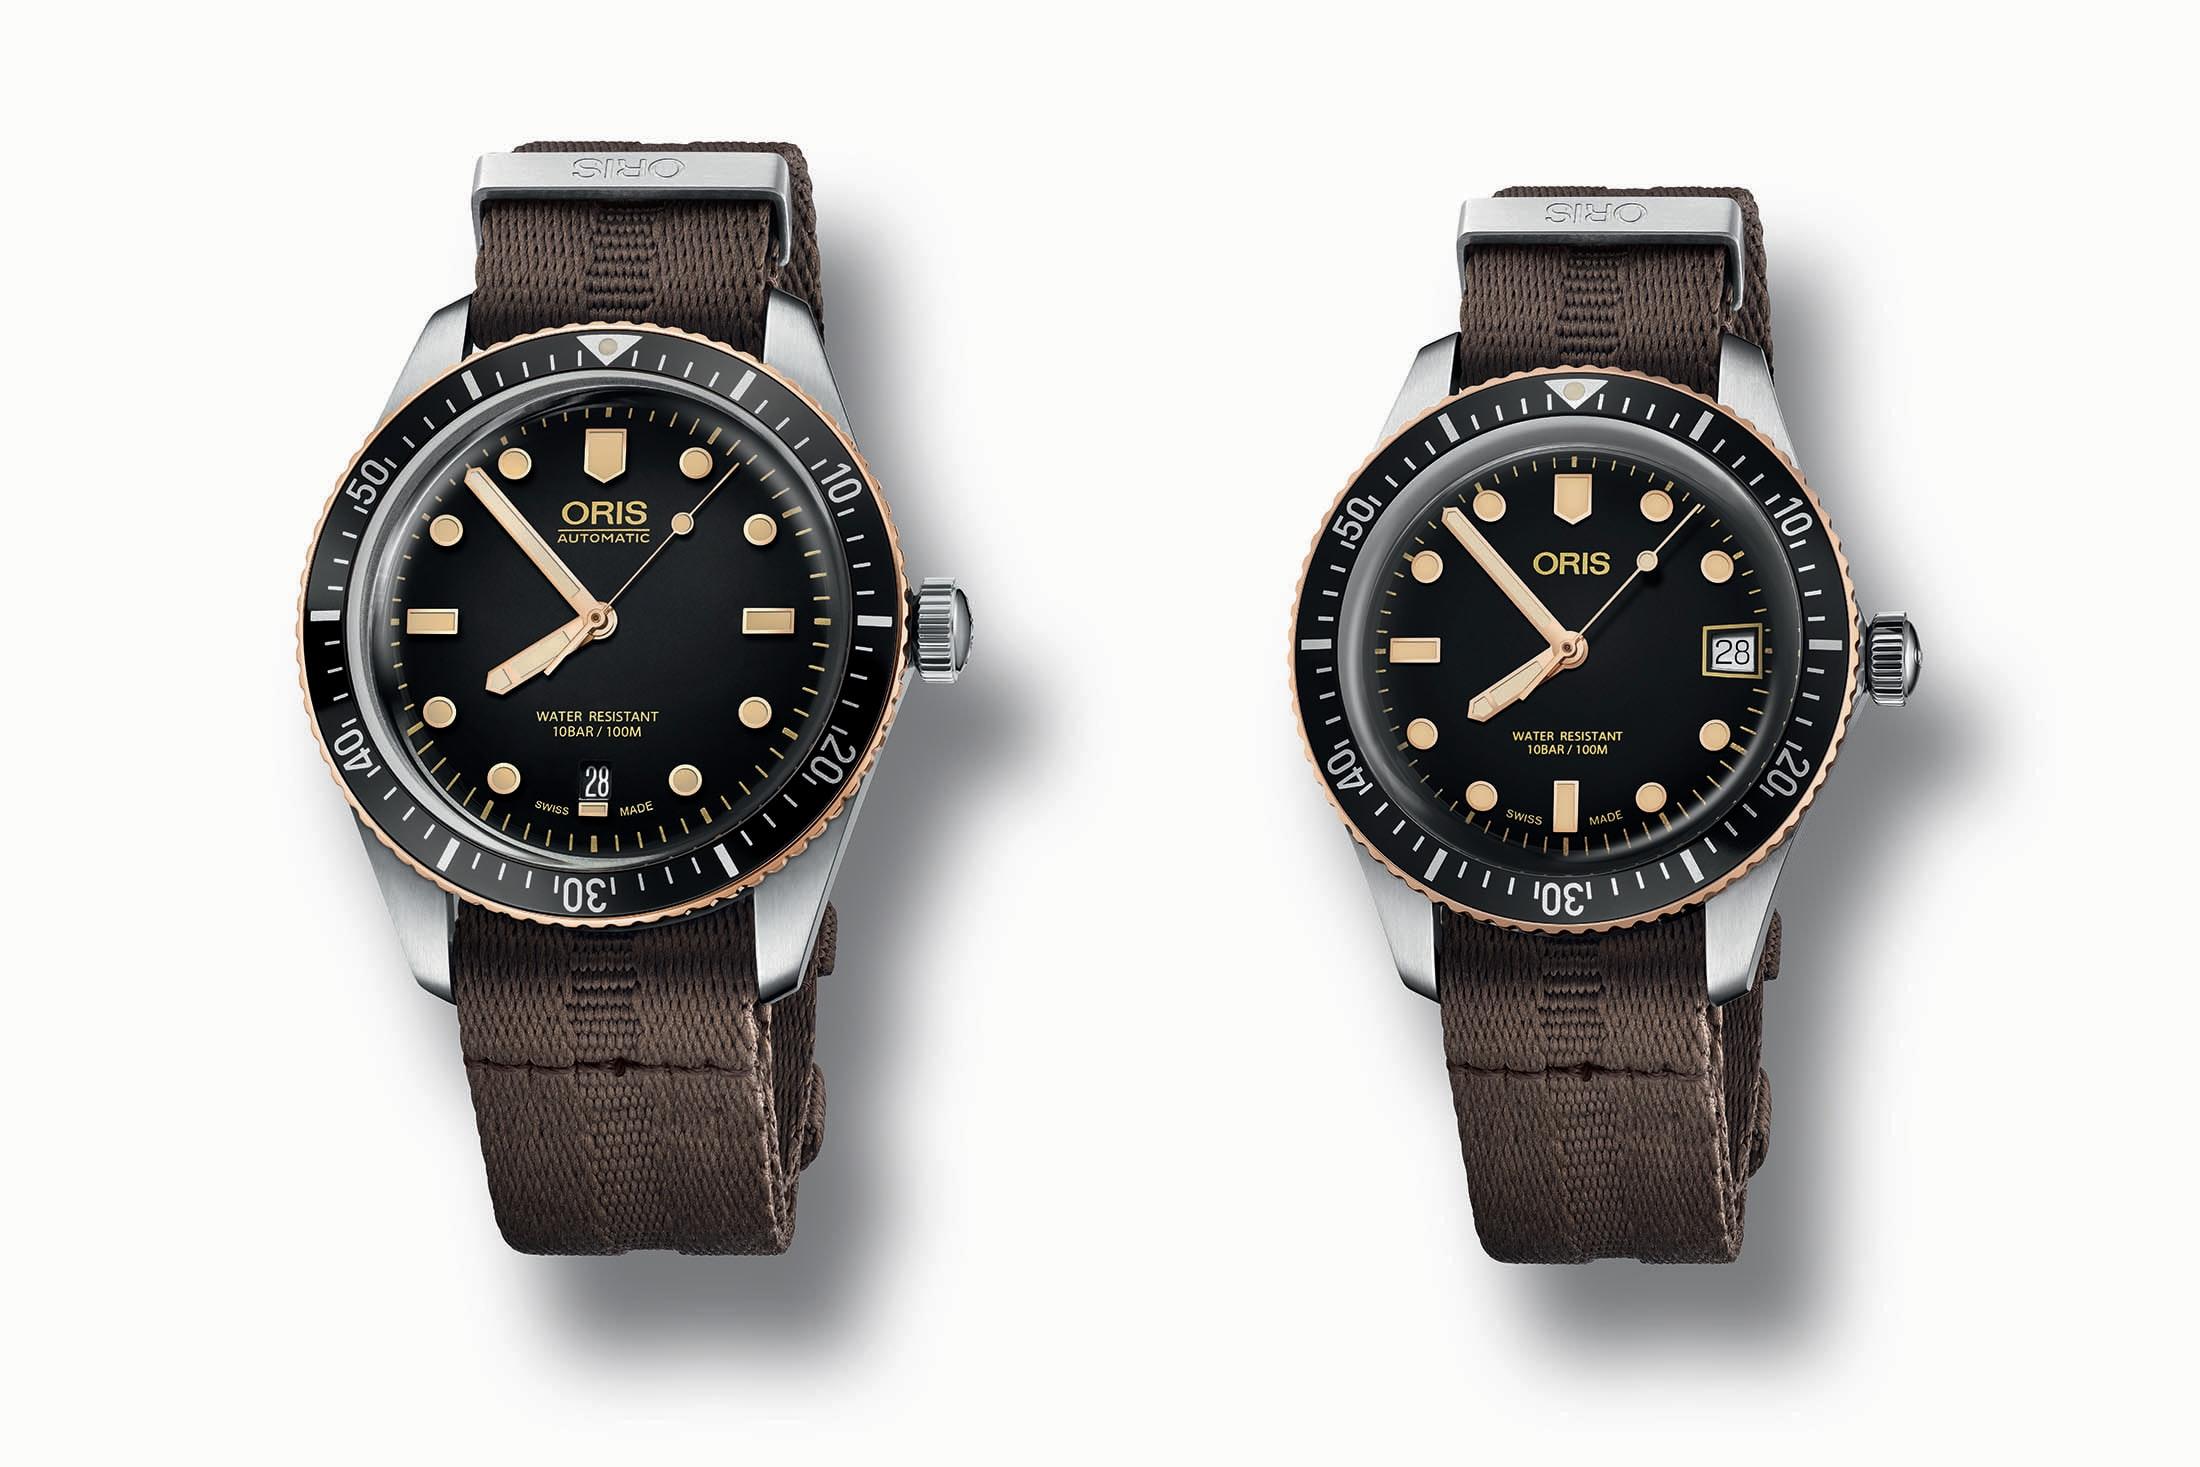 Oris-65-bronze-bezel-comparison.jpg?ixli